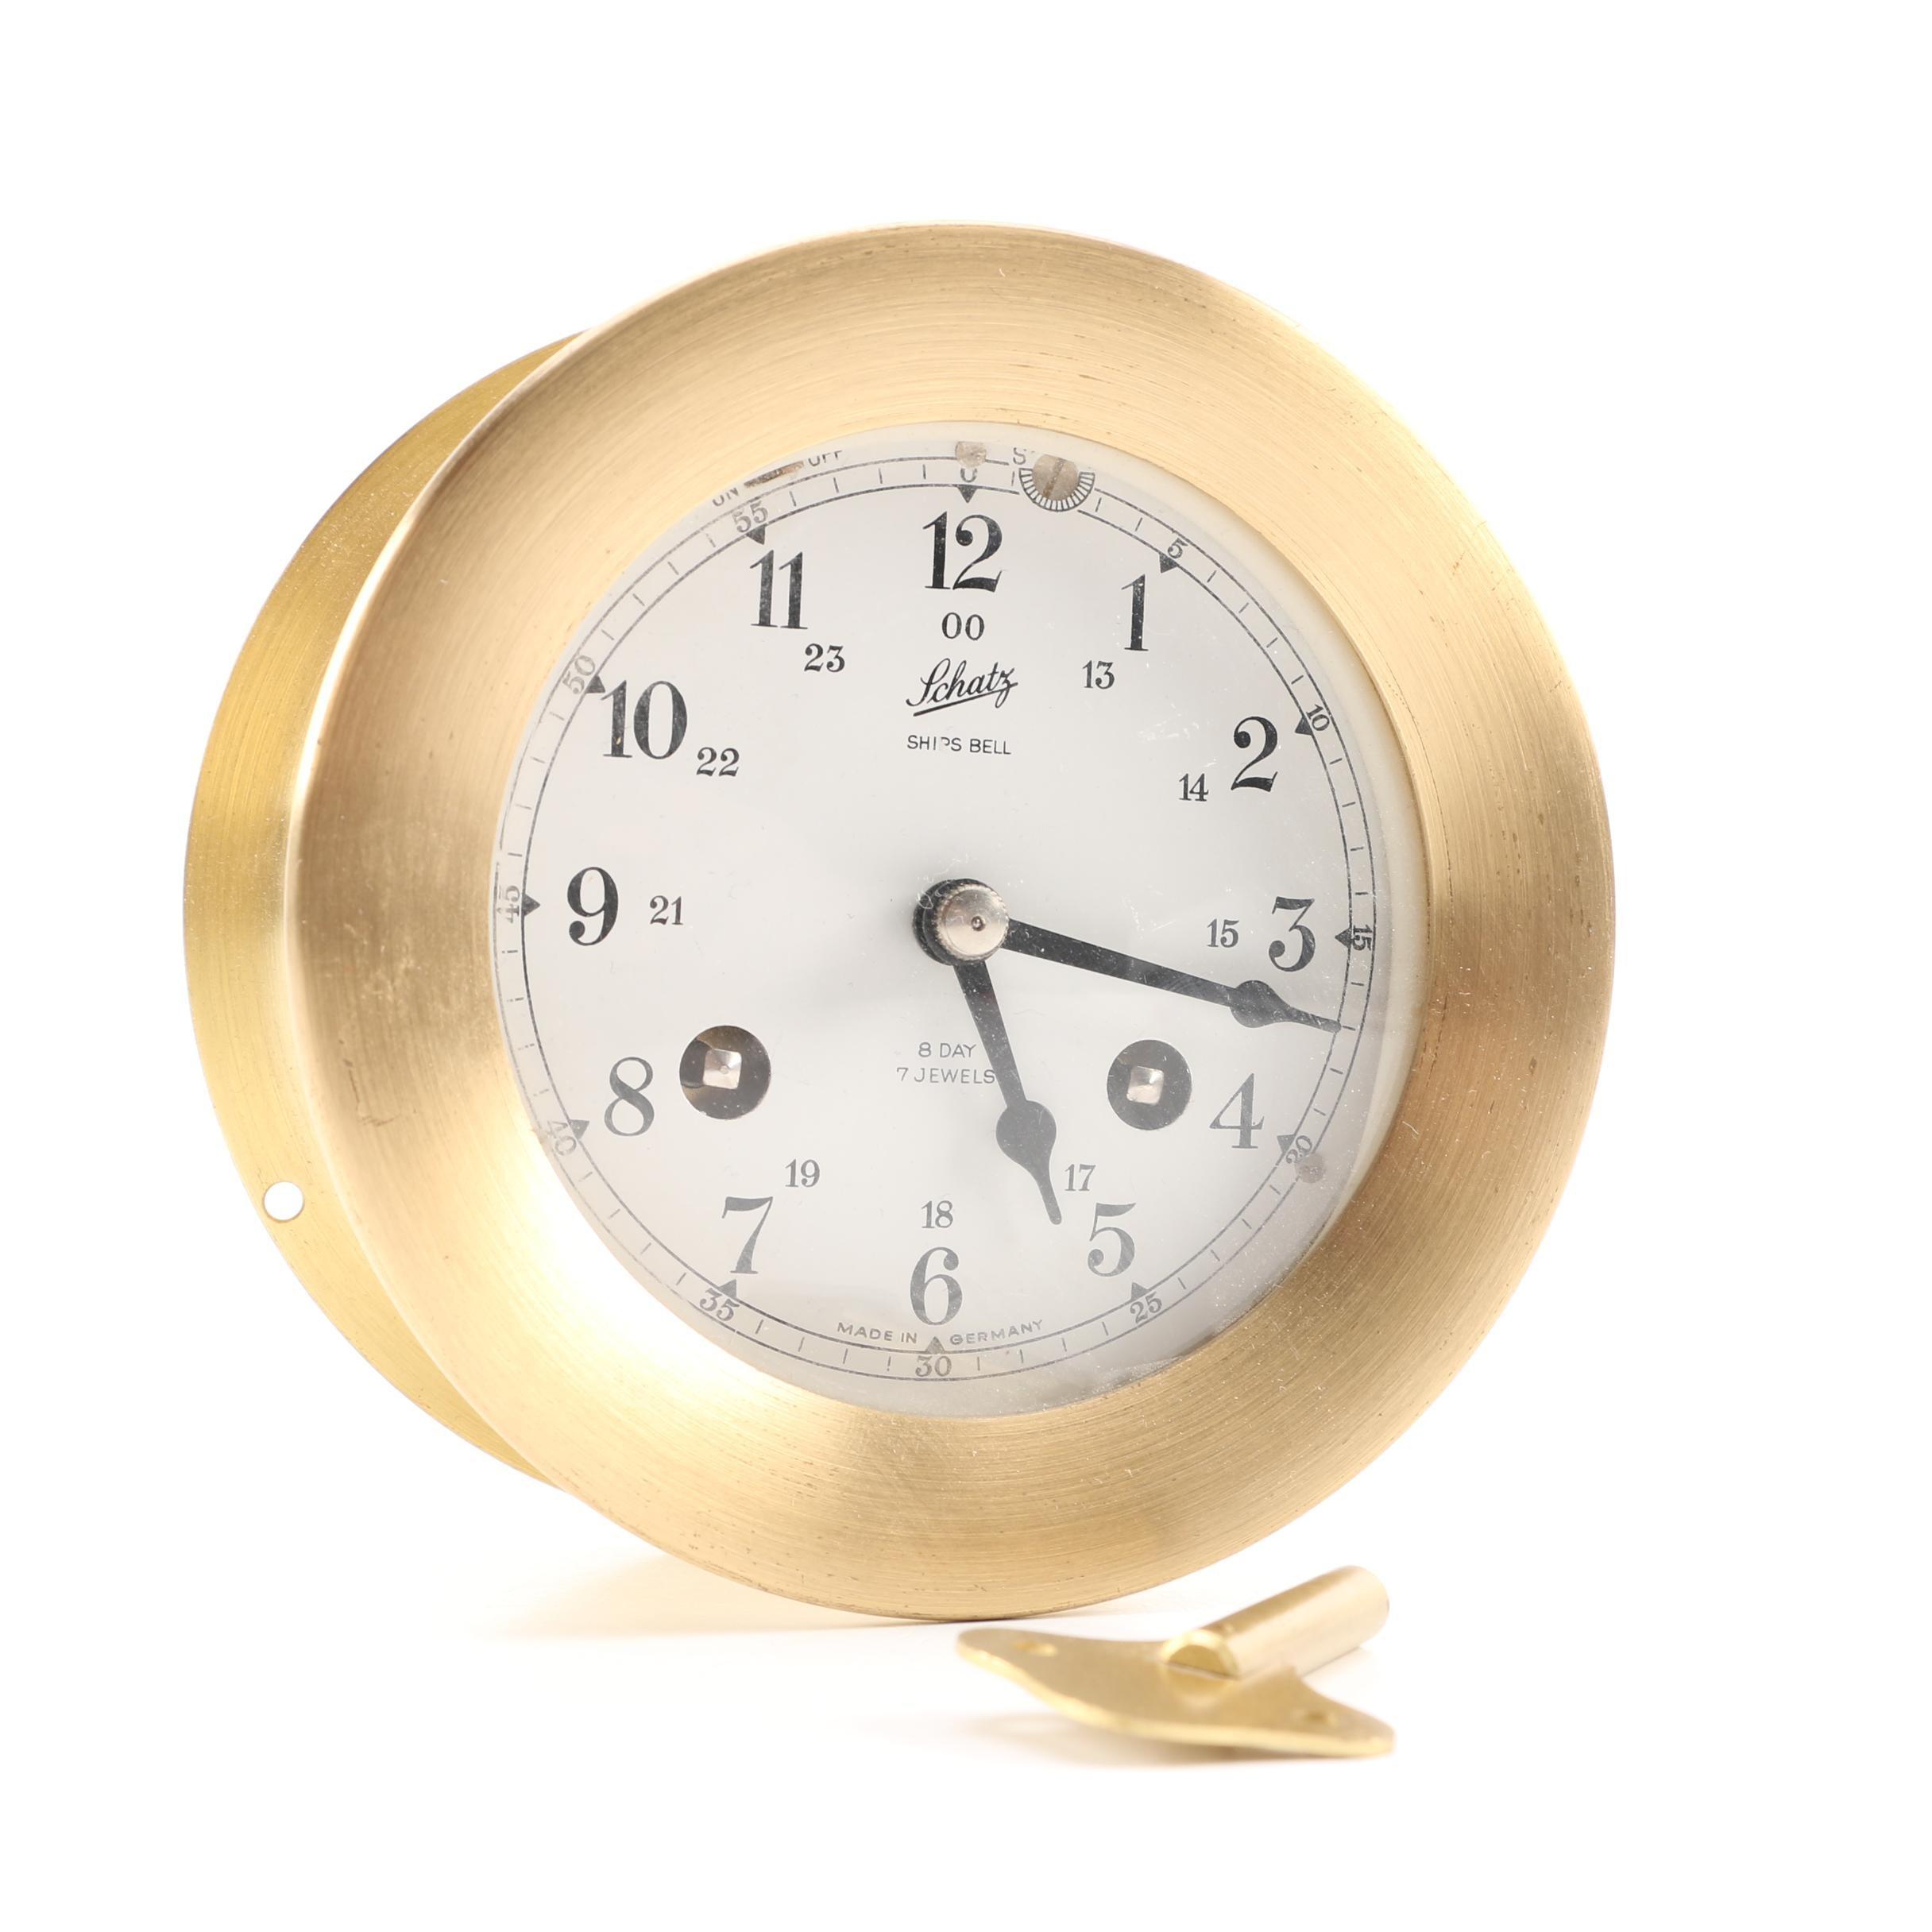 Schatz Brass Ship's Bell Clock from Germany